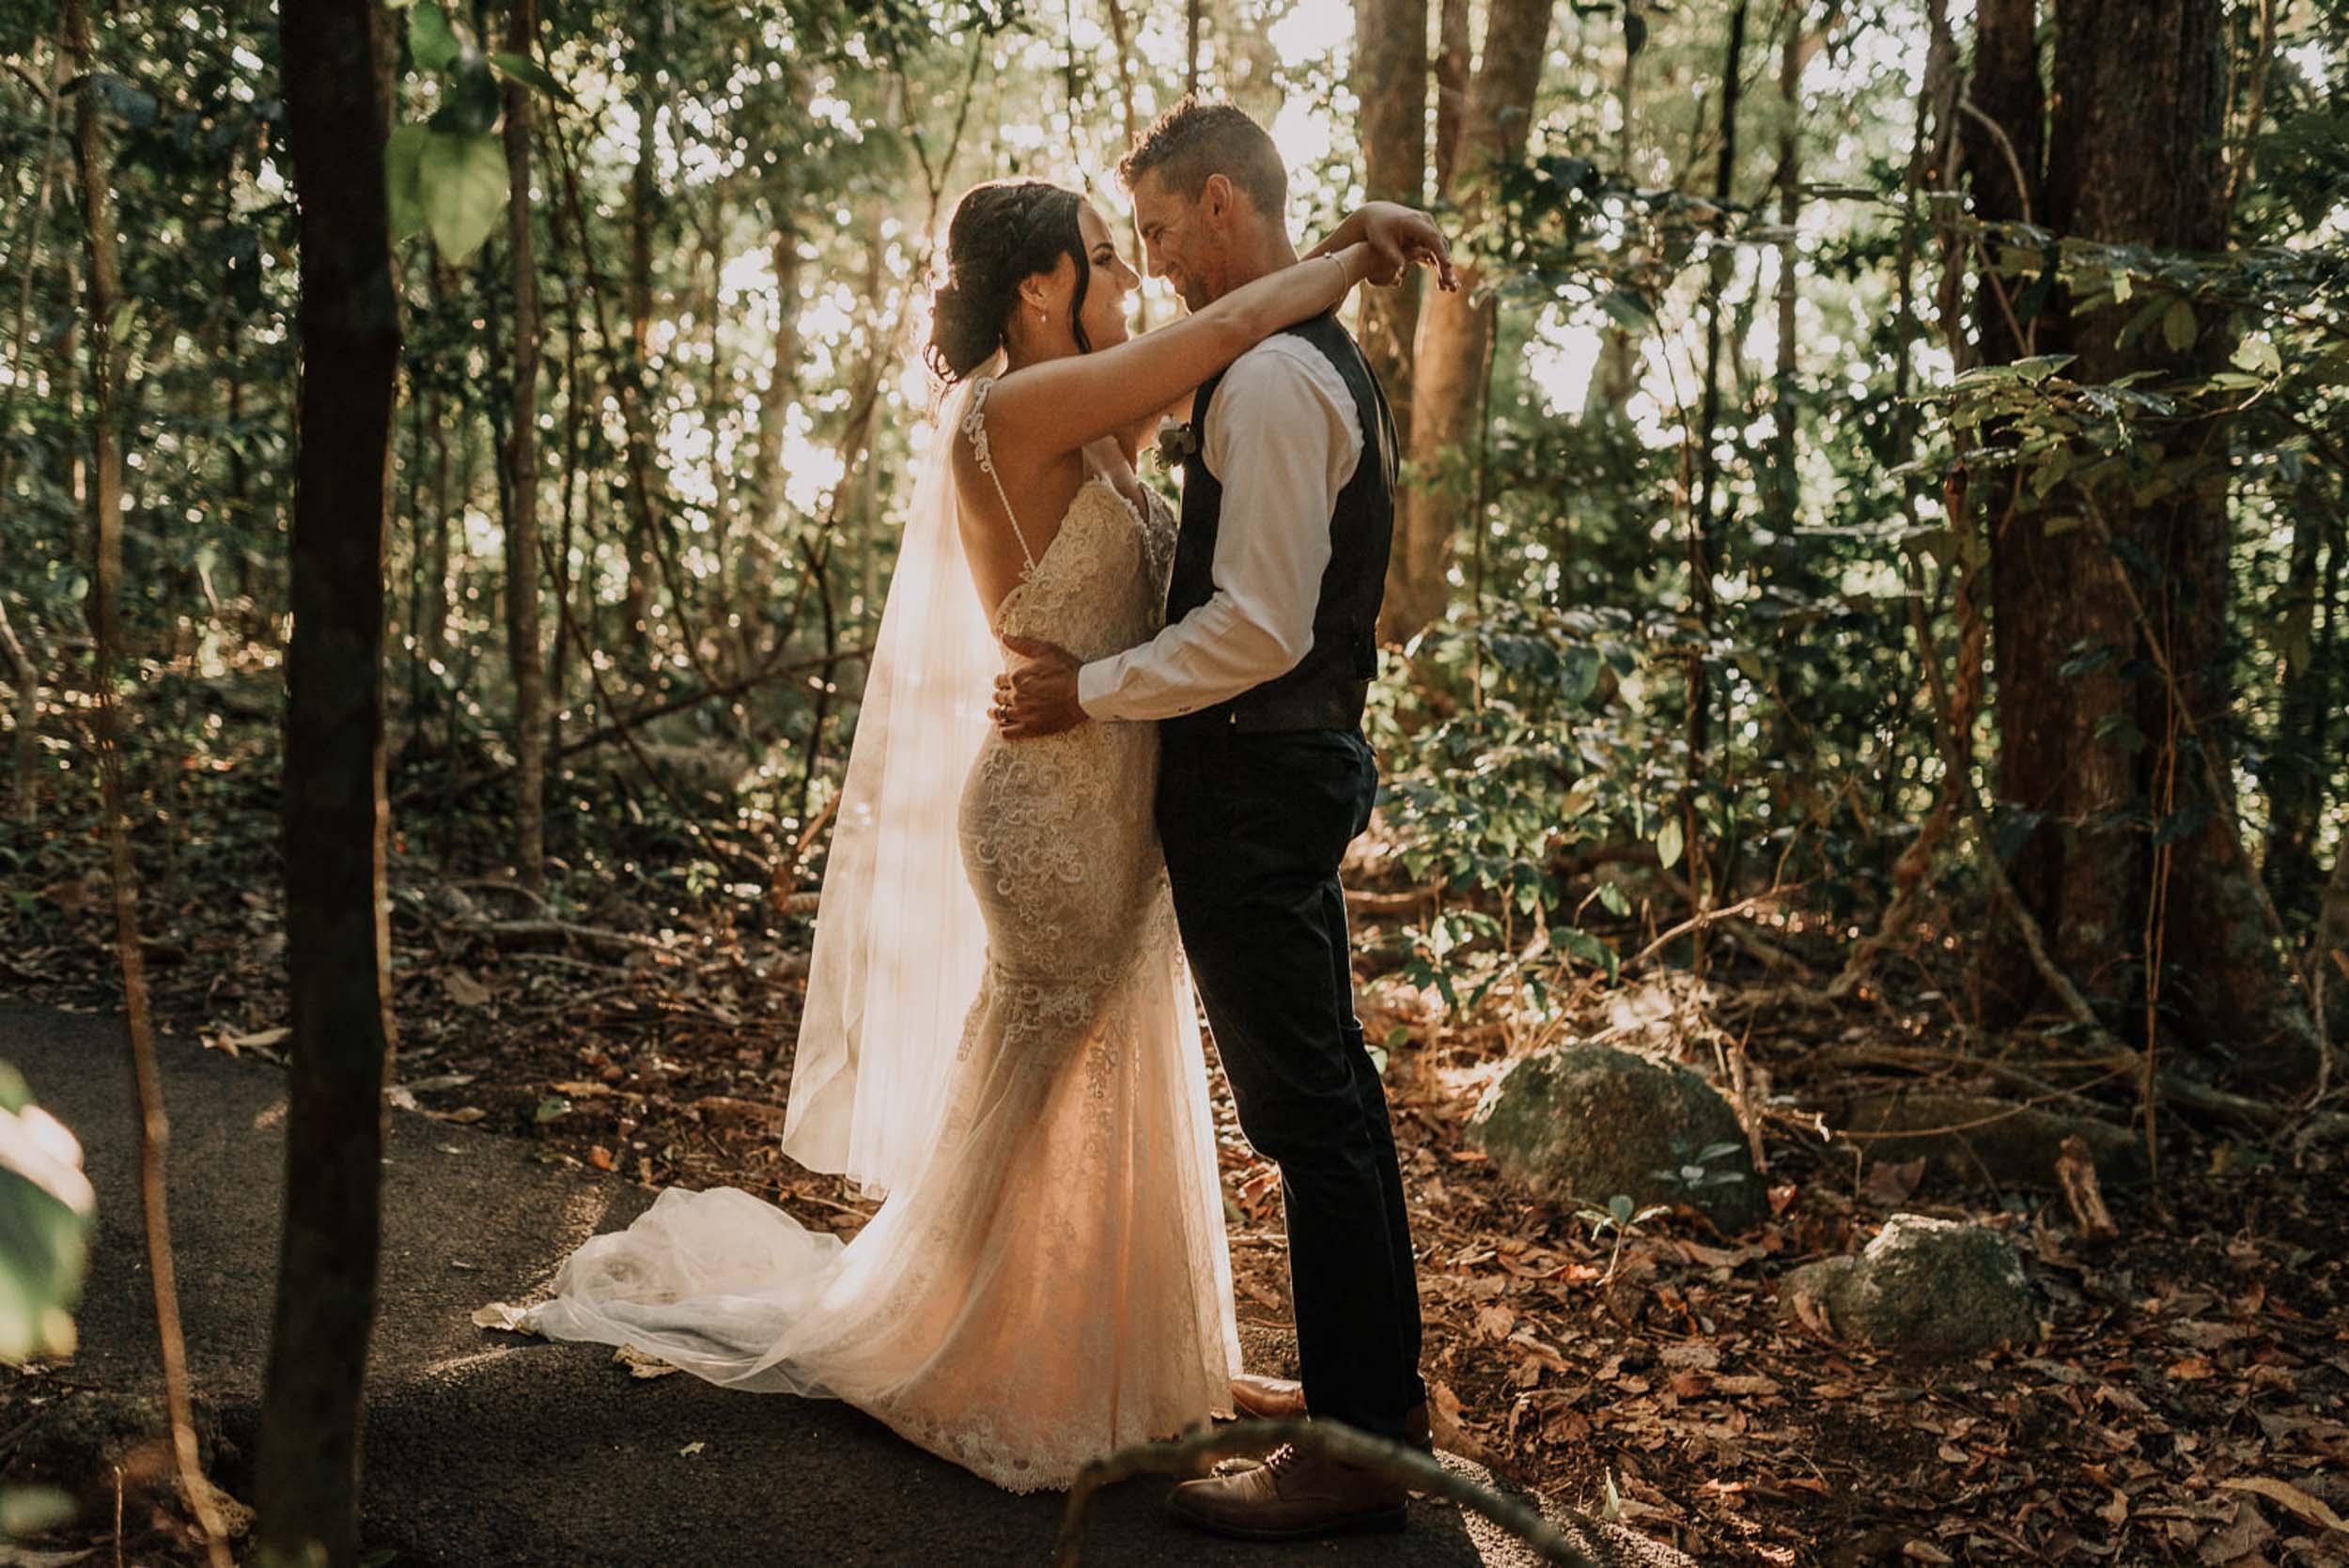 The Raw Photographer - Cairns Wedding Photographer - Fitzroy Island - Destination Wedding - Bride Dress - Groom Portrait - Queensland-30.jpg